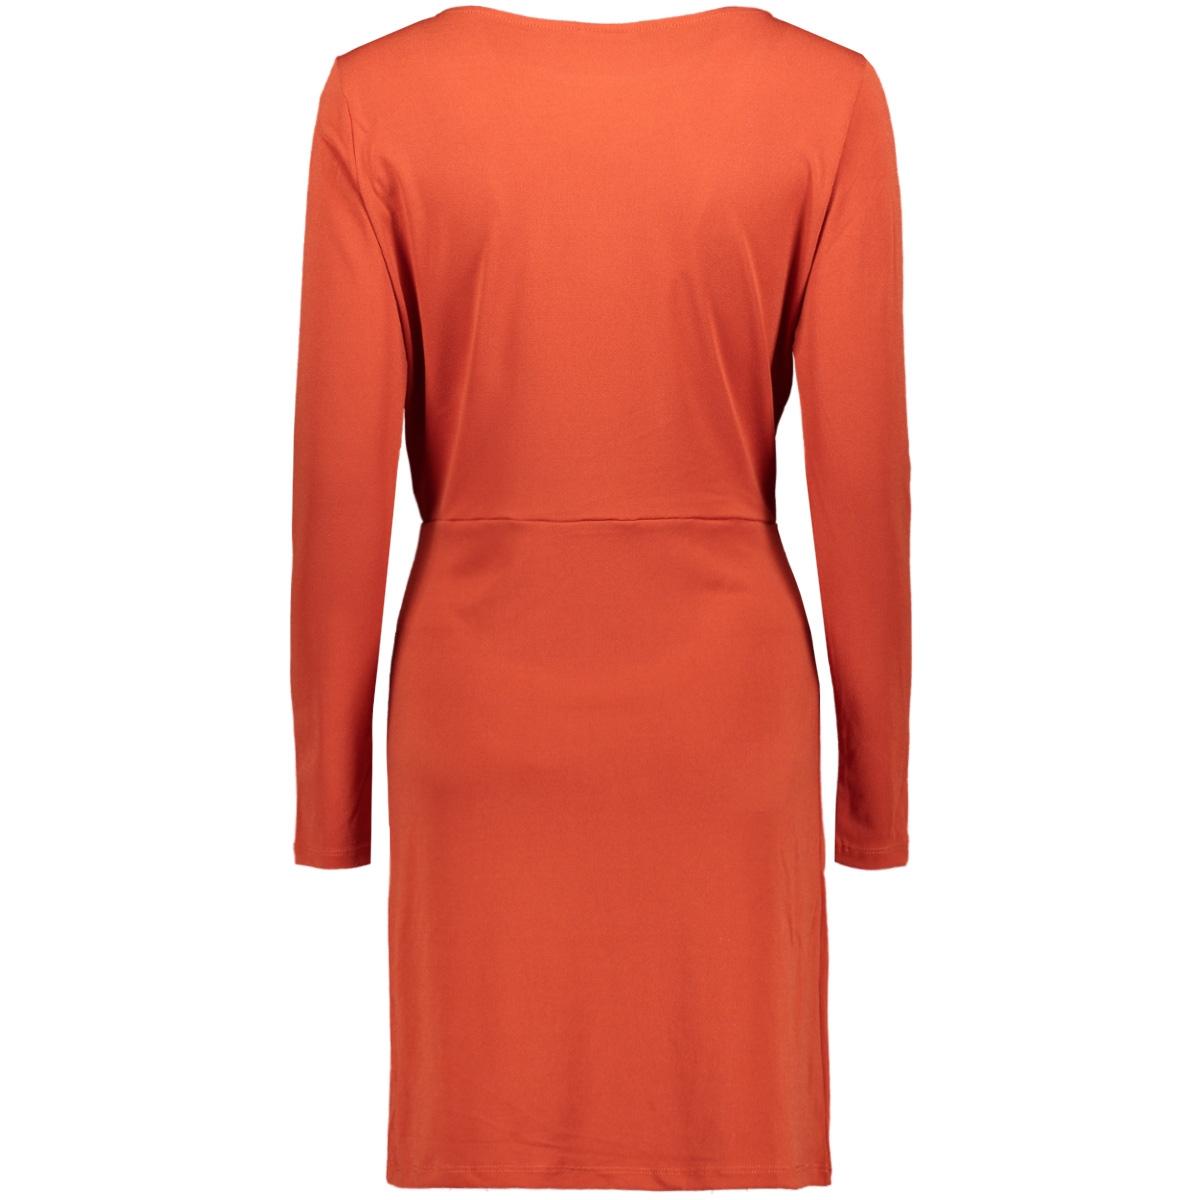 viclassy l/s detail dress - fav 14053360 vila jurk ketchup